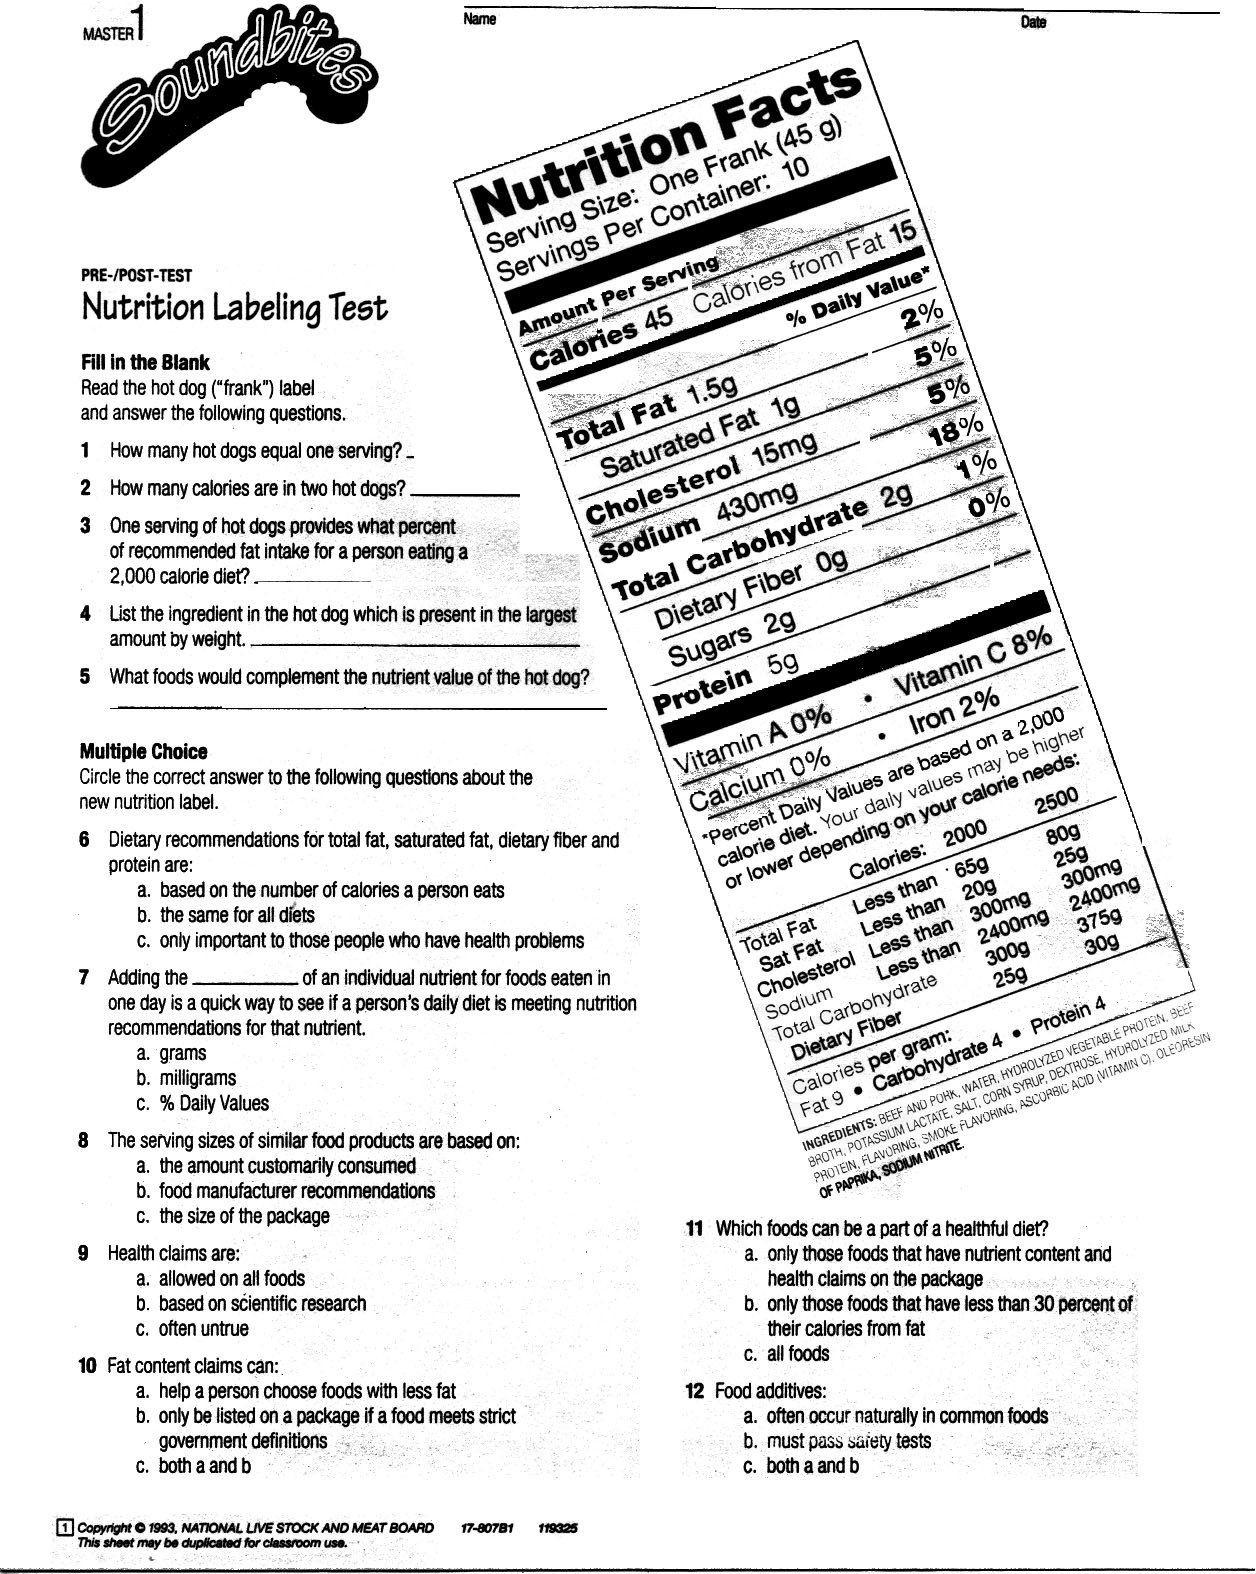 Reading Food Labels Worksheet Consumerism Food Labeling In 2020 Reading Food Labels Nutrition Labels Nutrition Activities